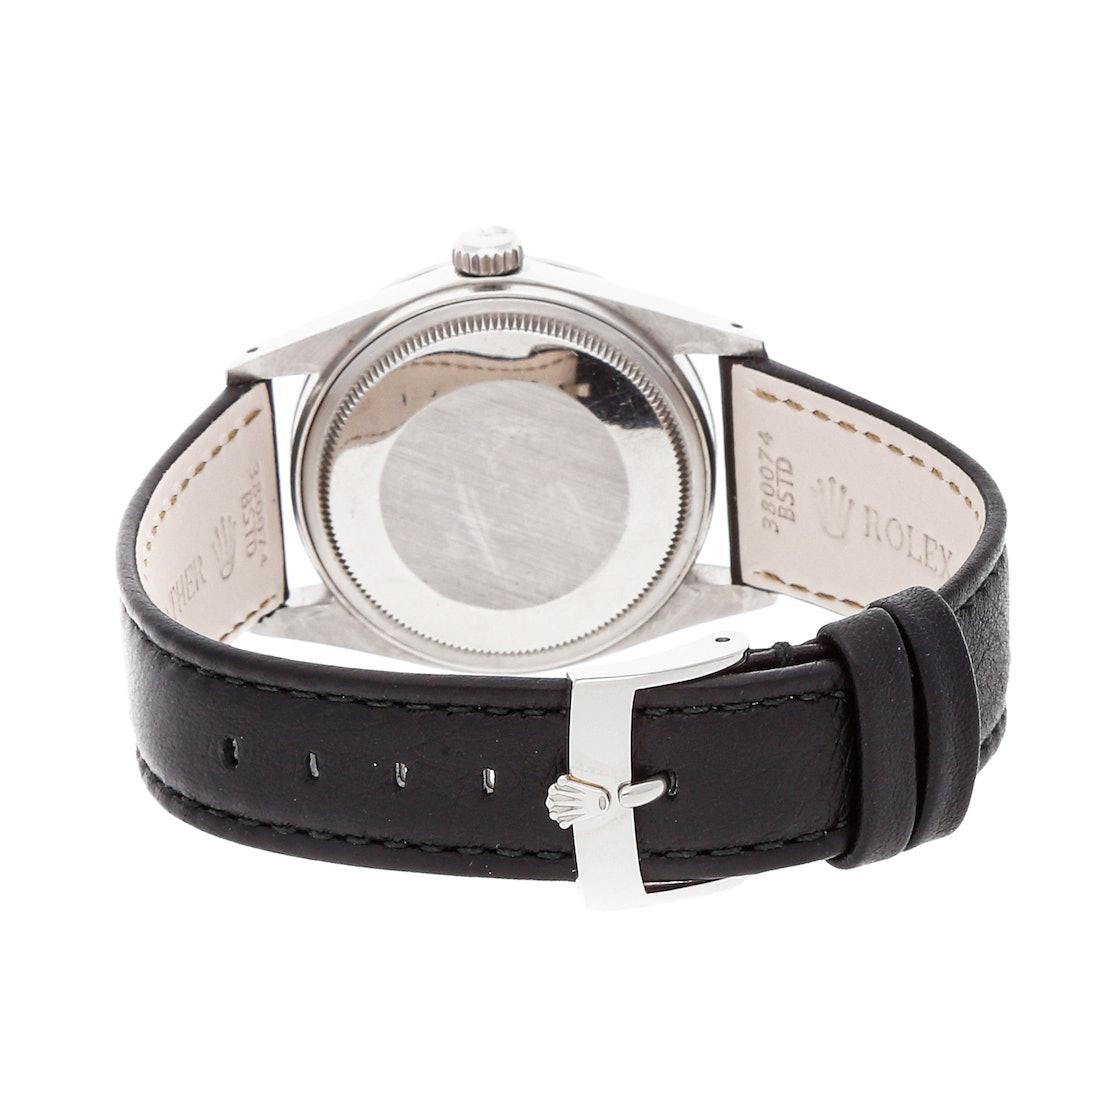 Rolex Datejust 16030